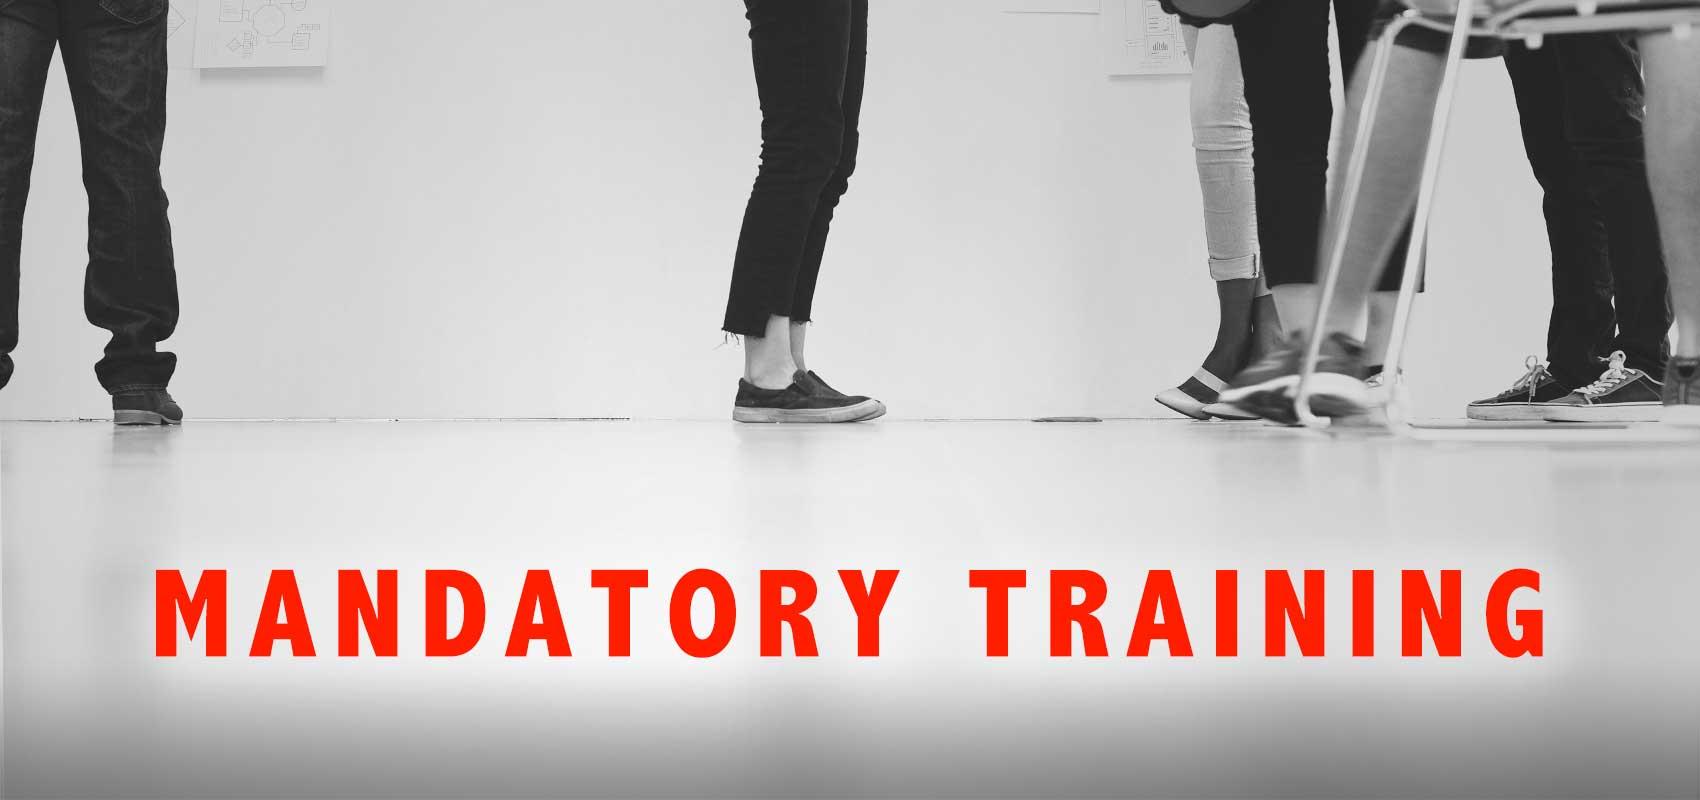 Mandatory Training